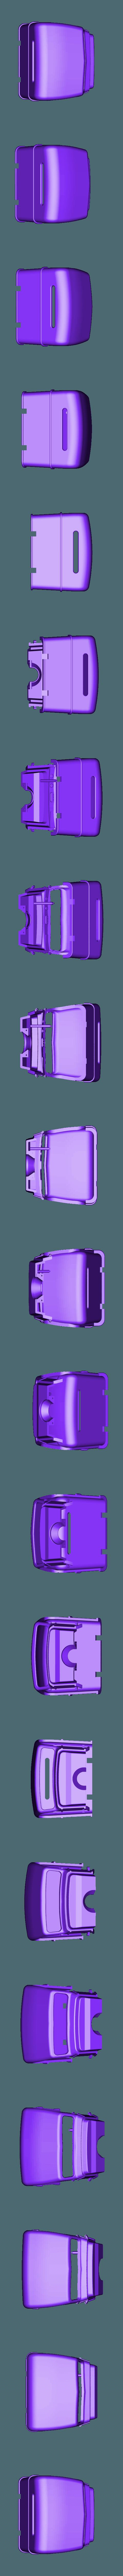 hotrod pickup body no doors.stl Download STL file Ratrod Pickup • 3D printing template, macone1